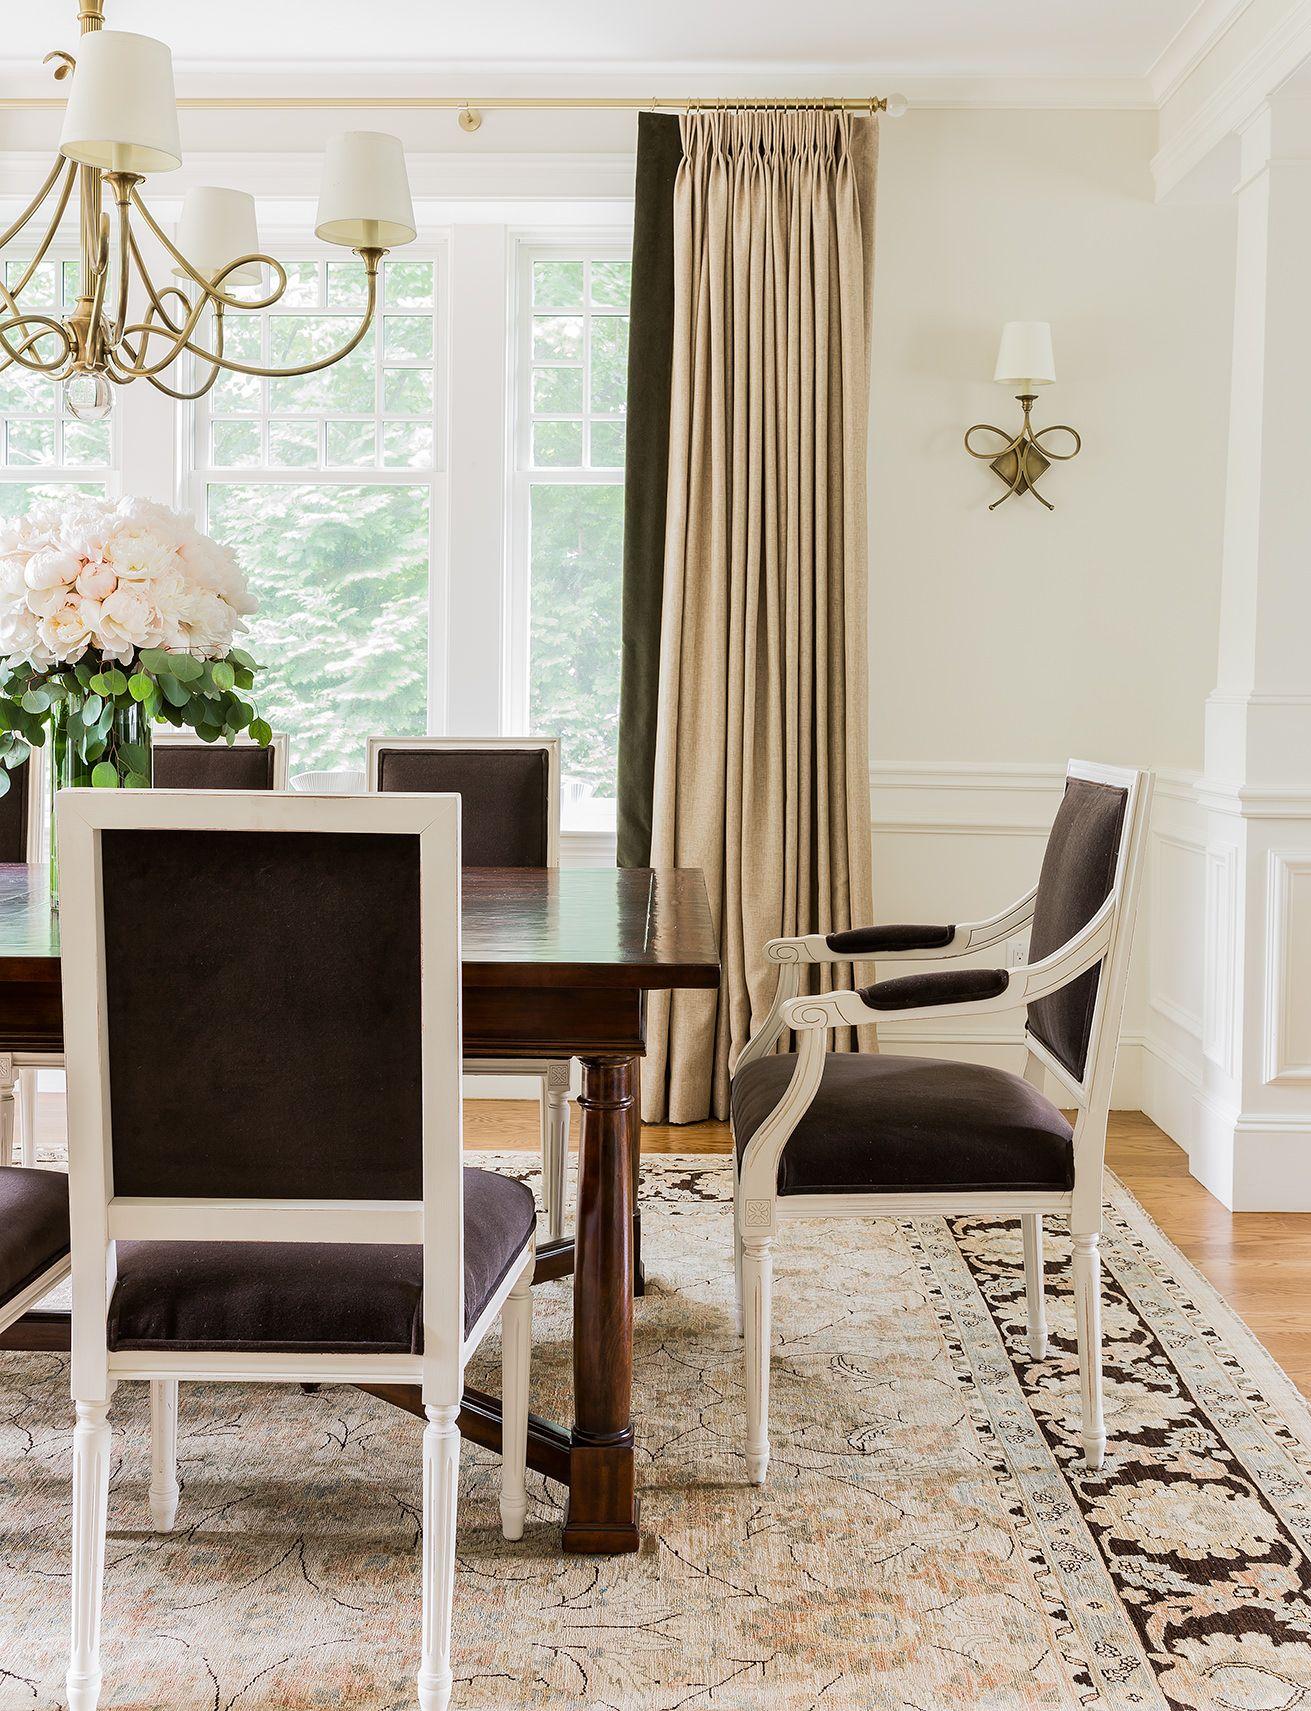 Elegant Light Fixture Chandelier For The Dining Room Renovated